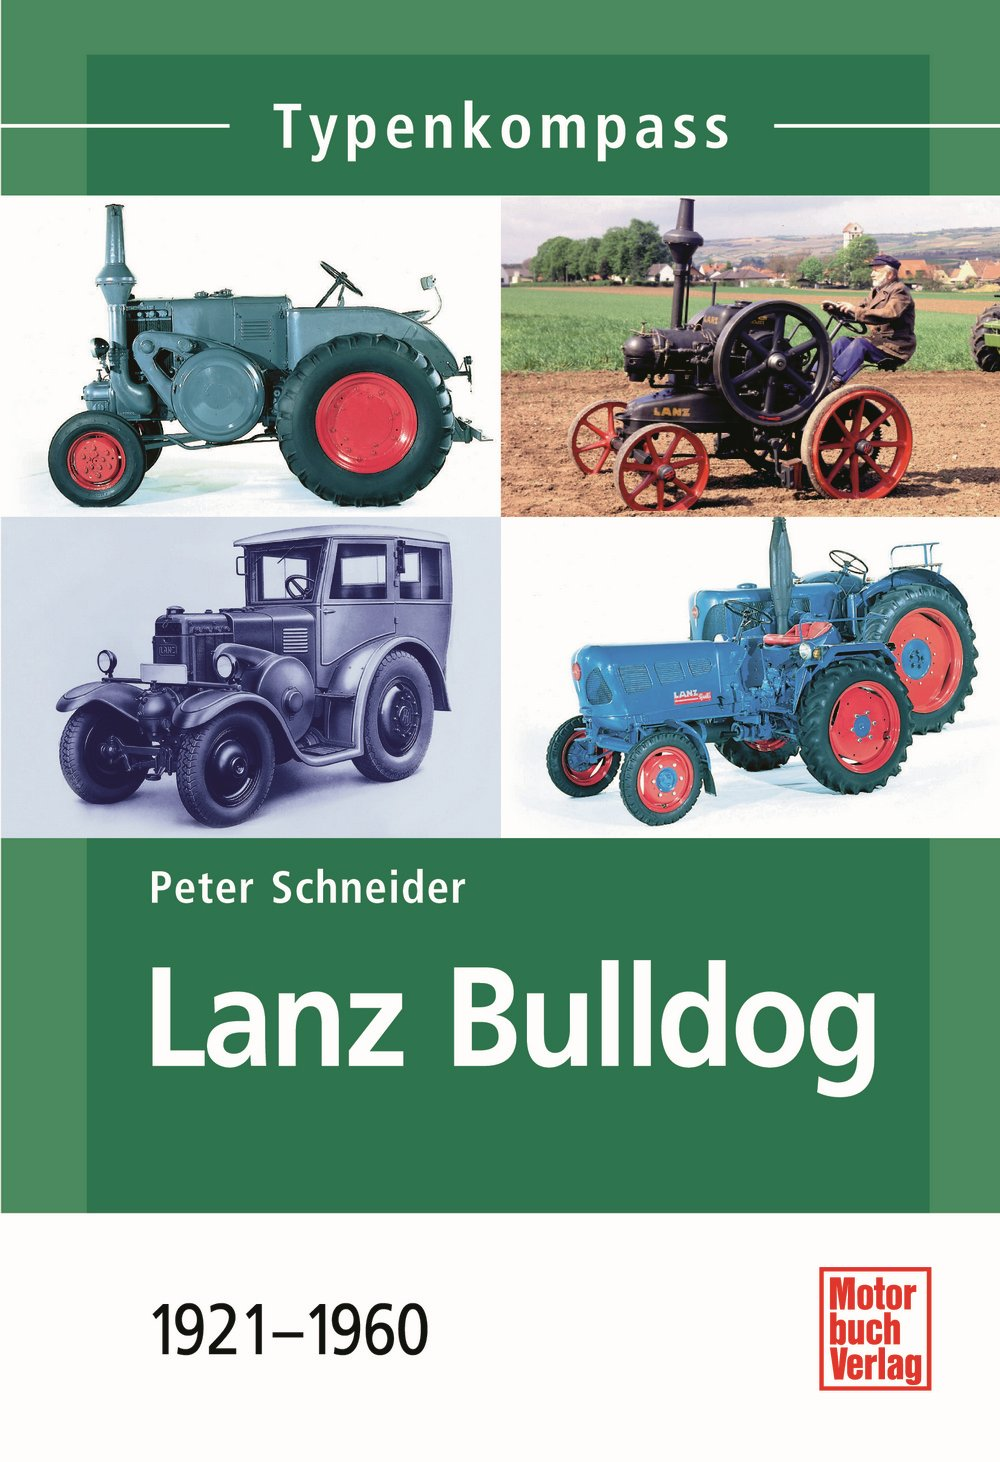 Boek: Lanz Bulldog - 1921-1960